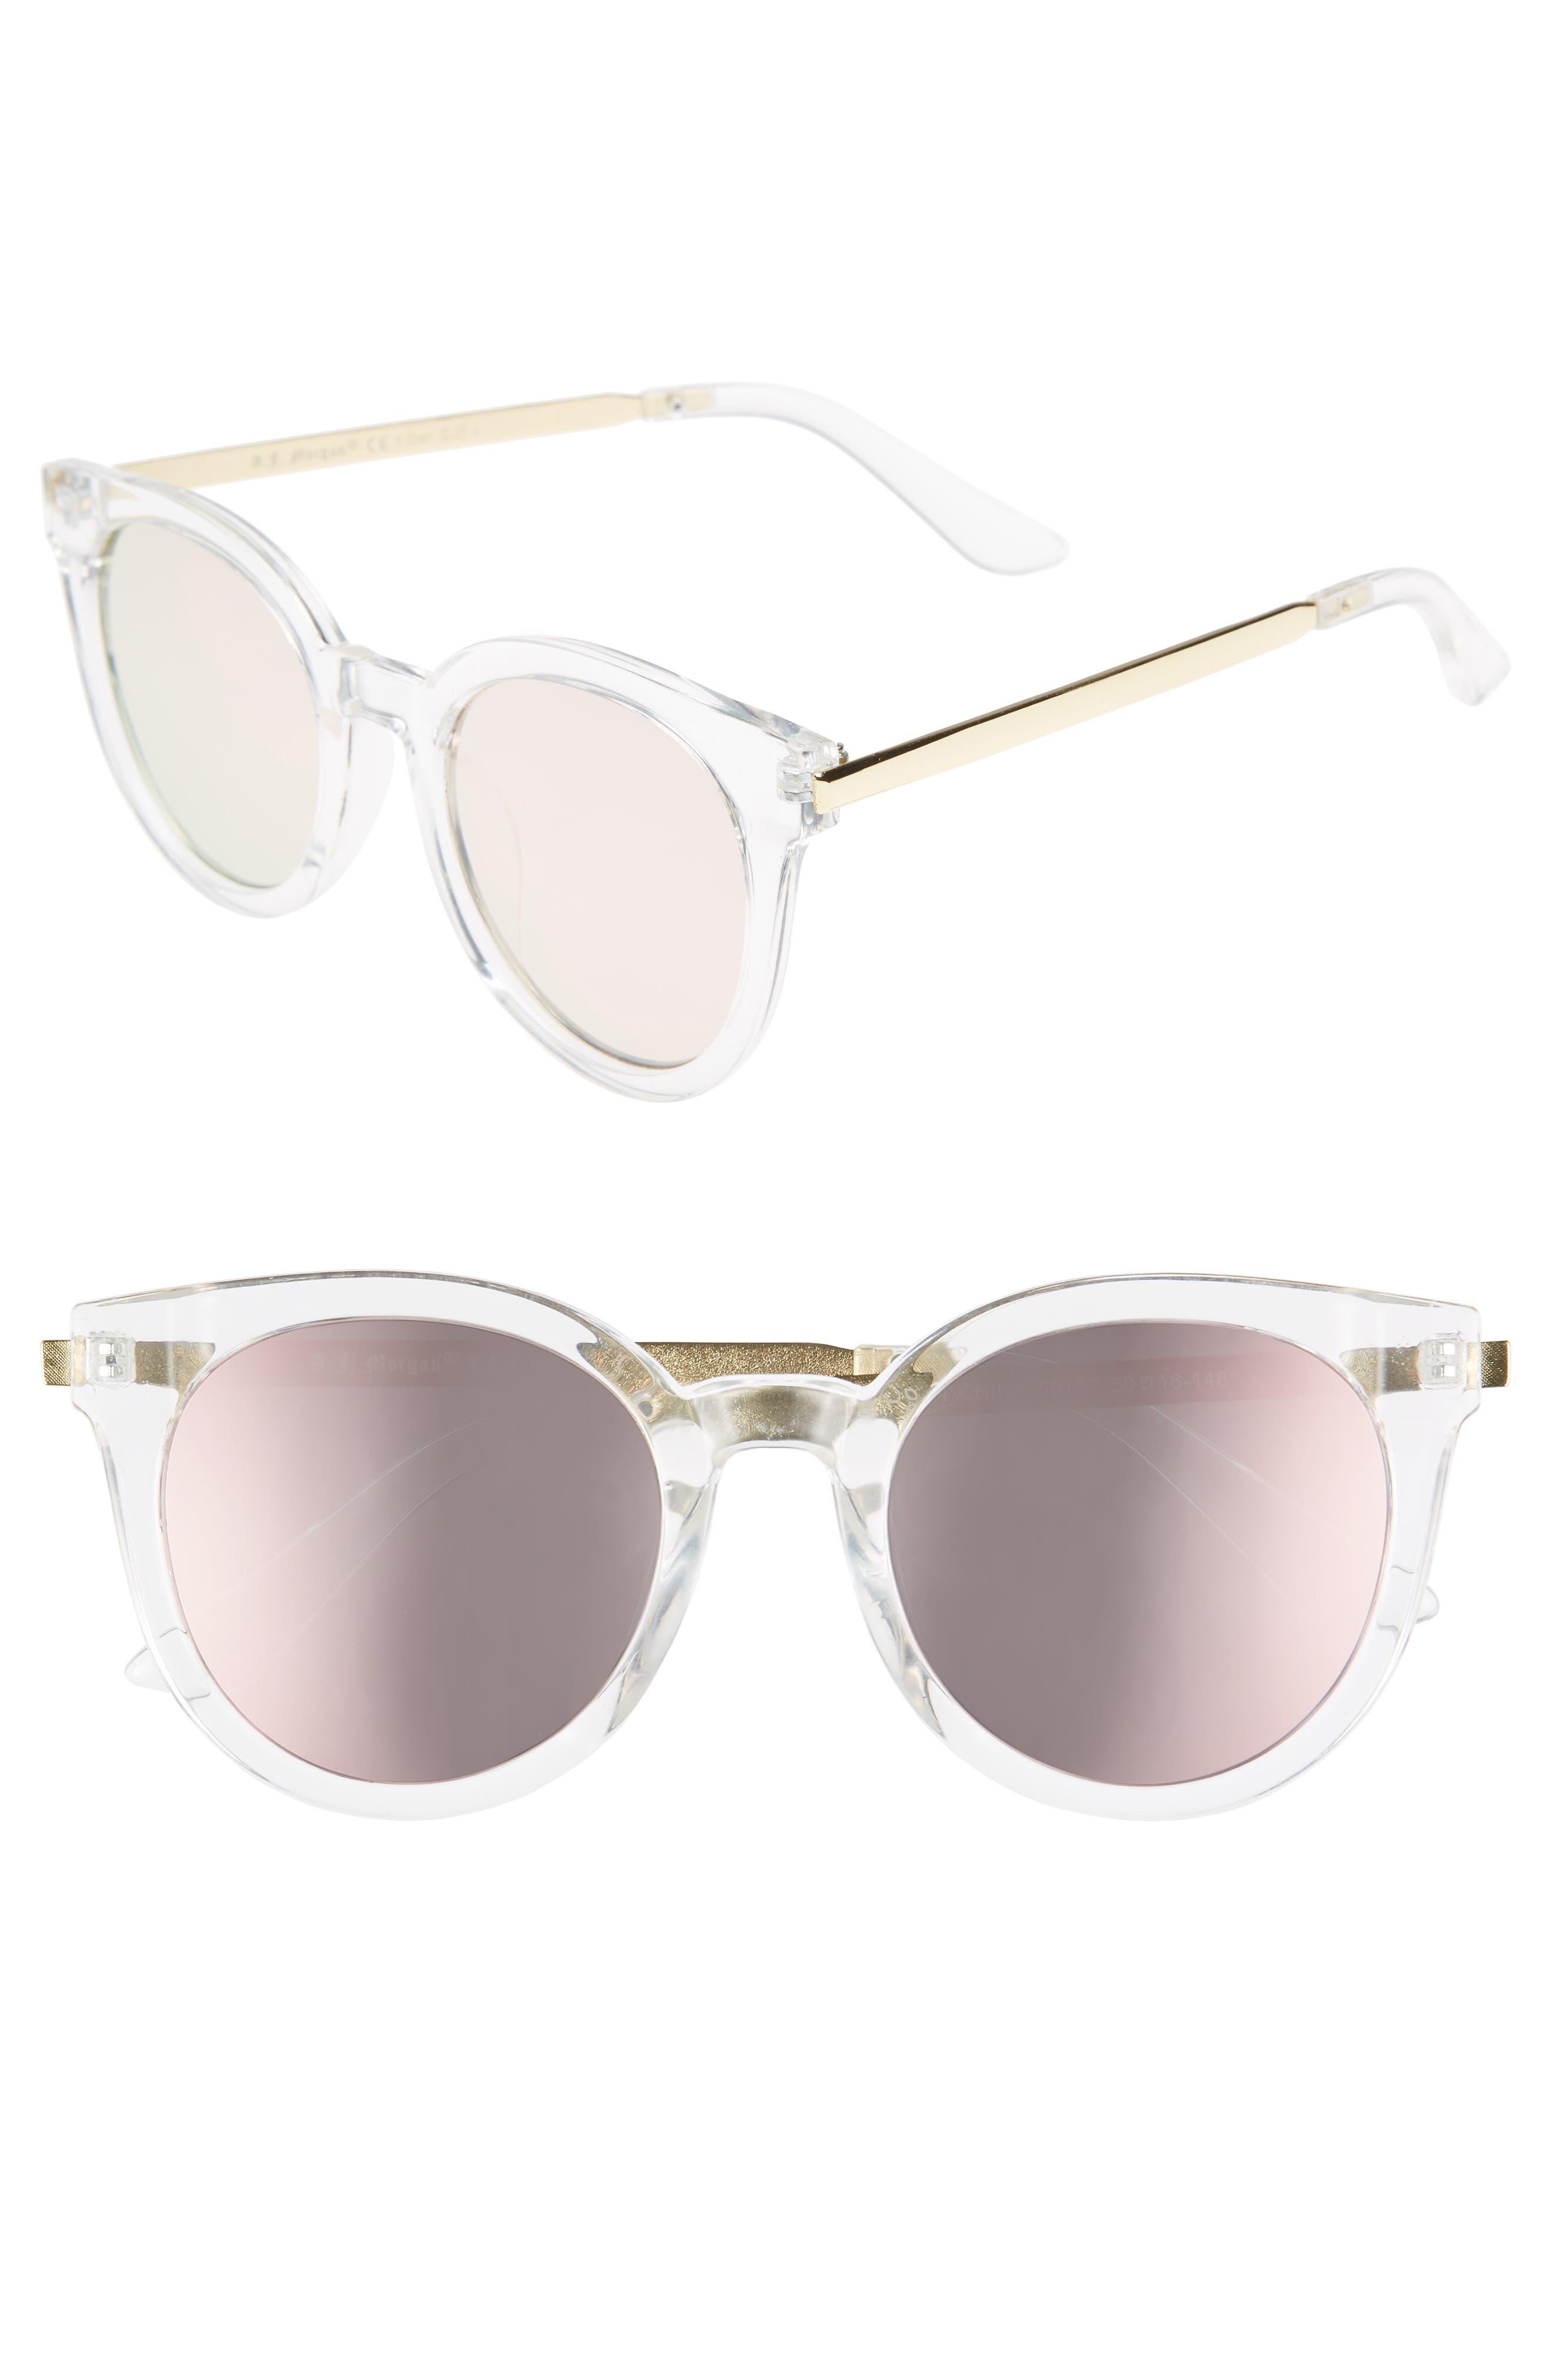 A.J. Morgan Hi There 50mm Mirrored Round Sunglasses